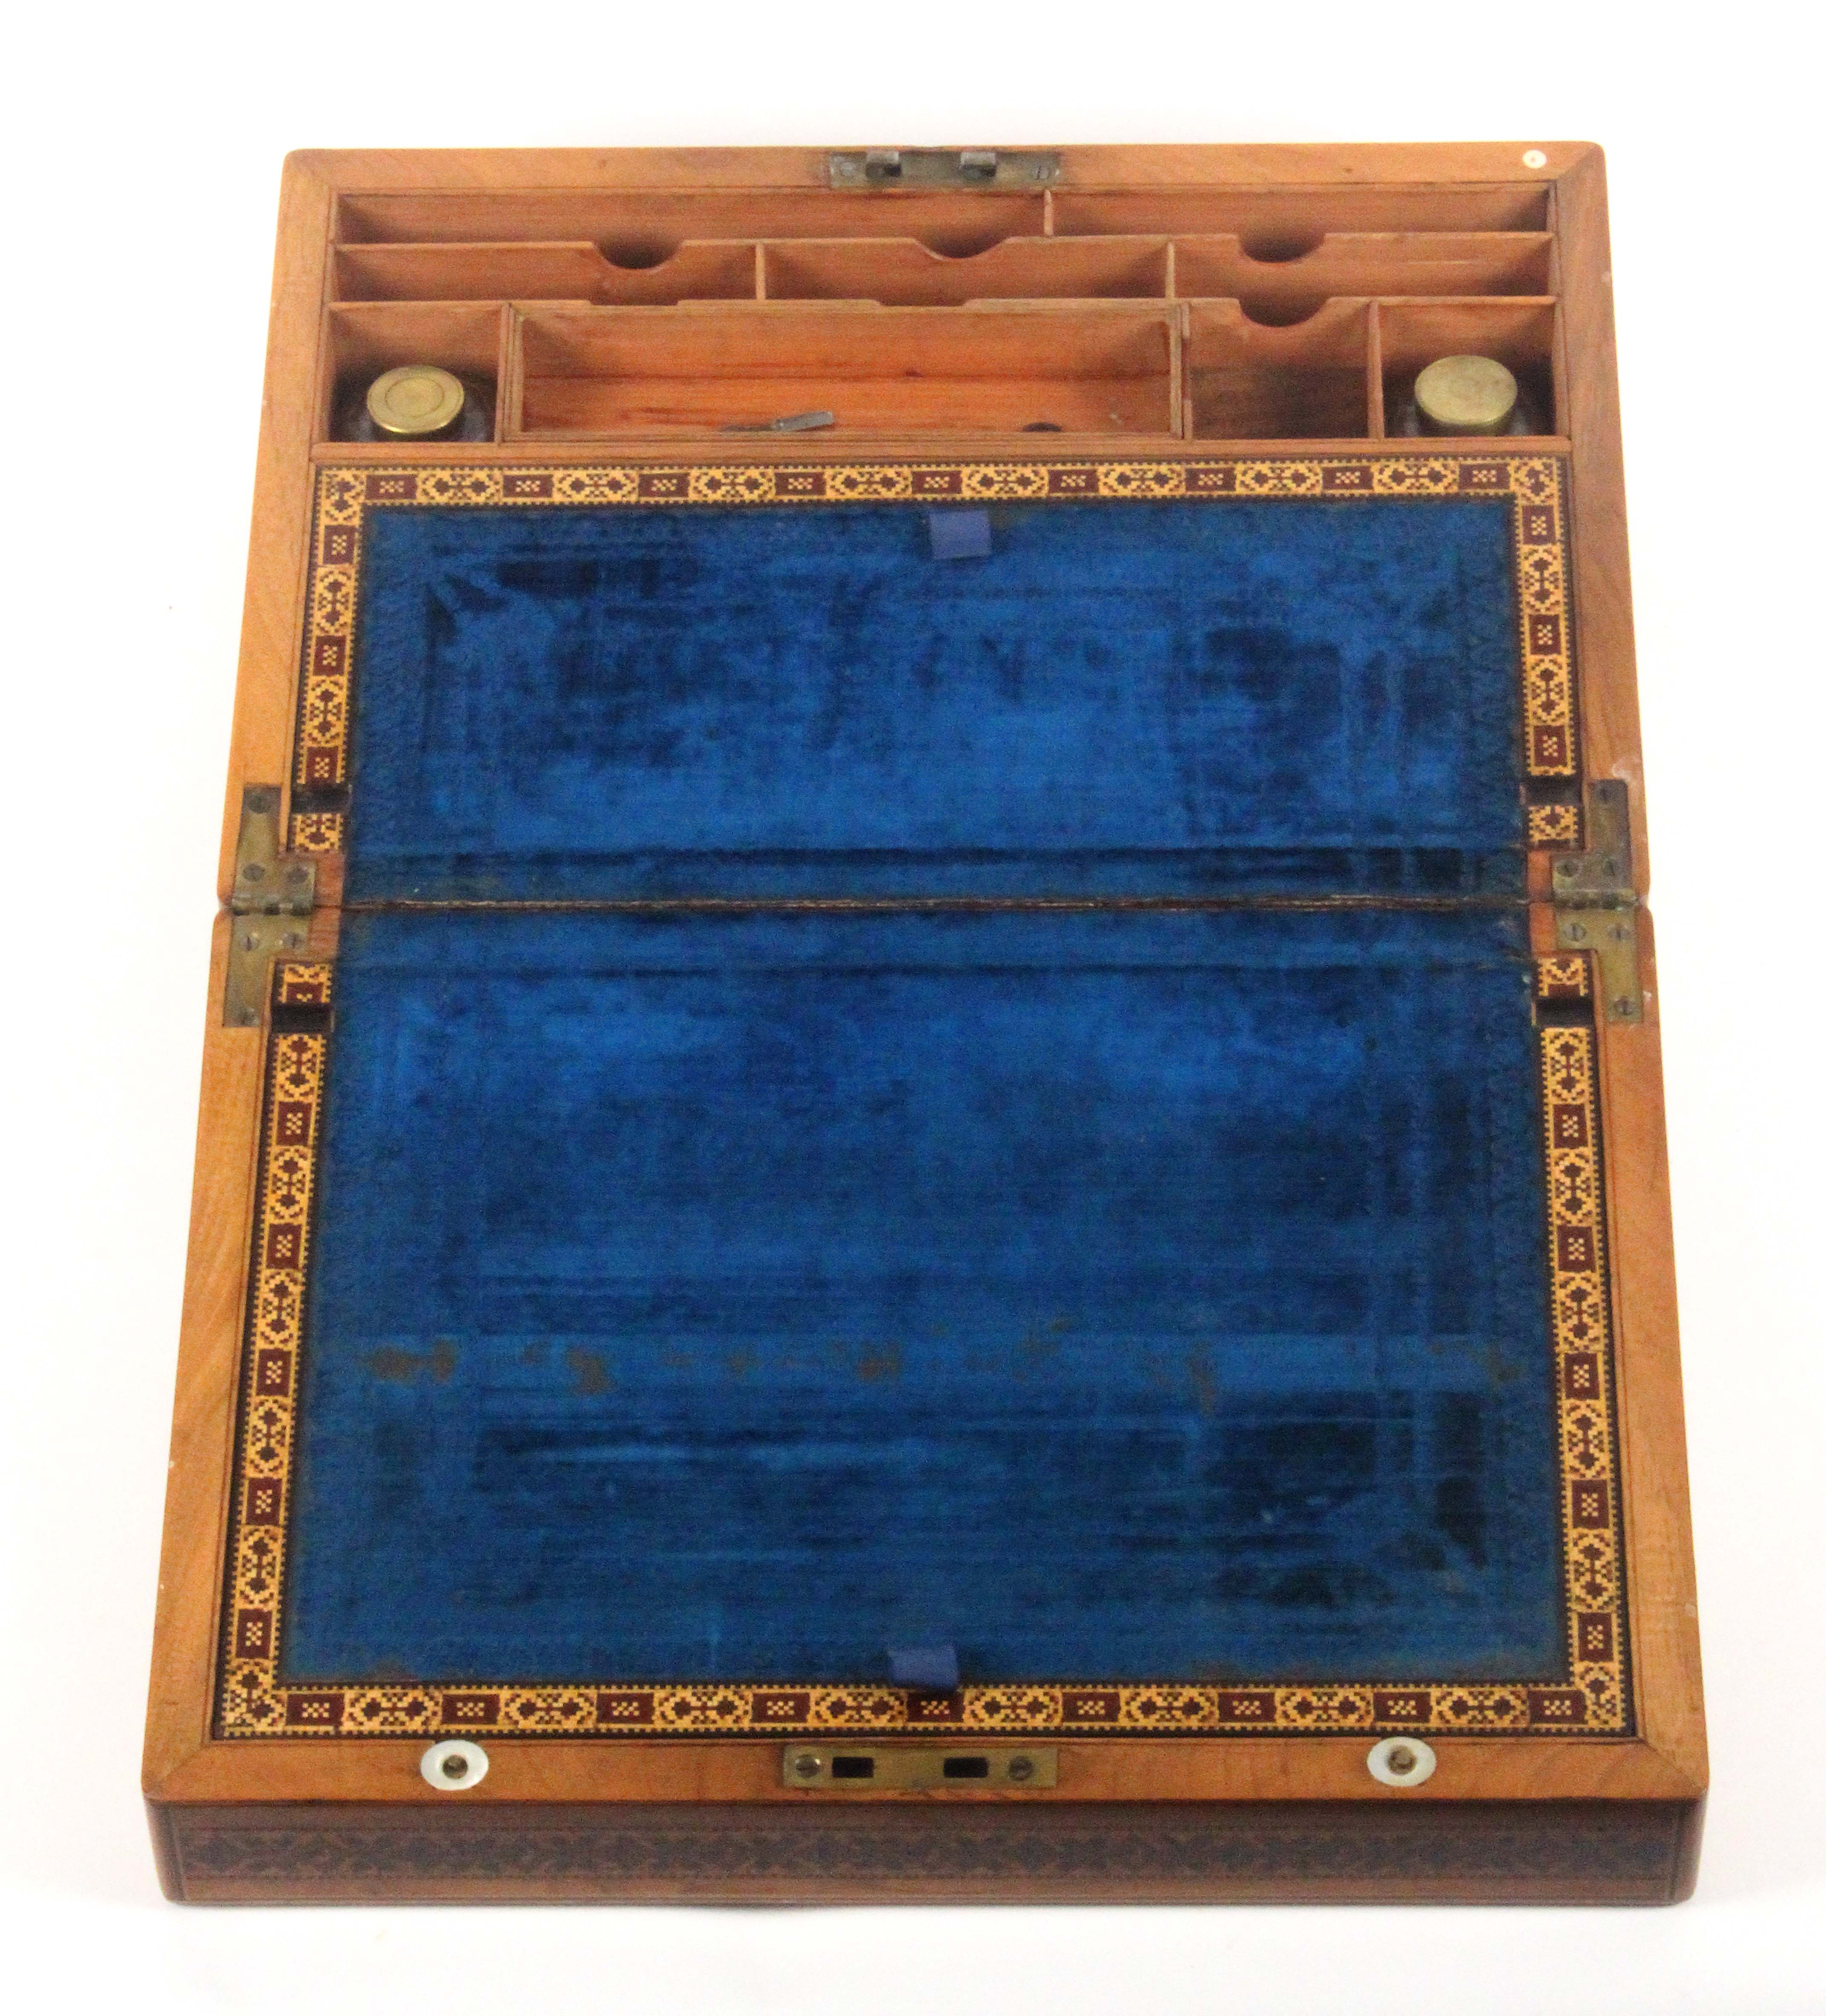 A rare Tunbridge ware mahogany writing box, the lid with an inset mosaic panel of Tunbridge Castle - Image 3 of 4